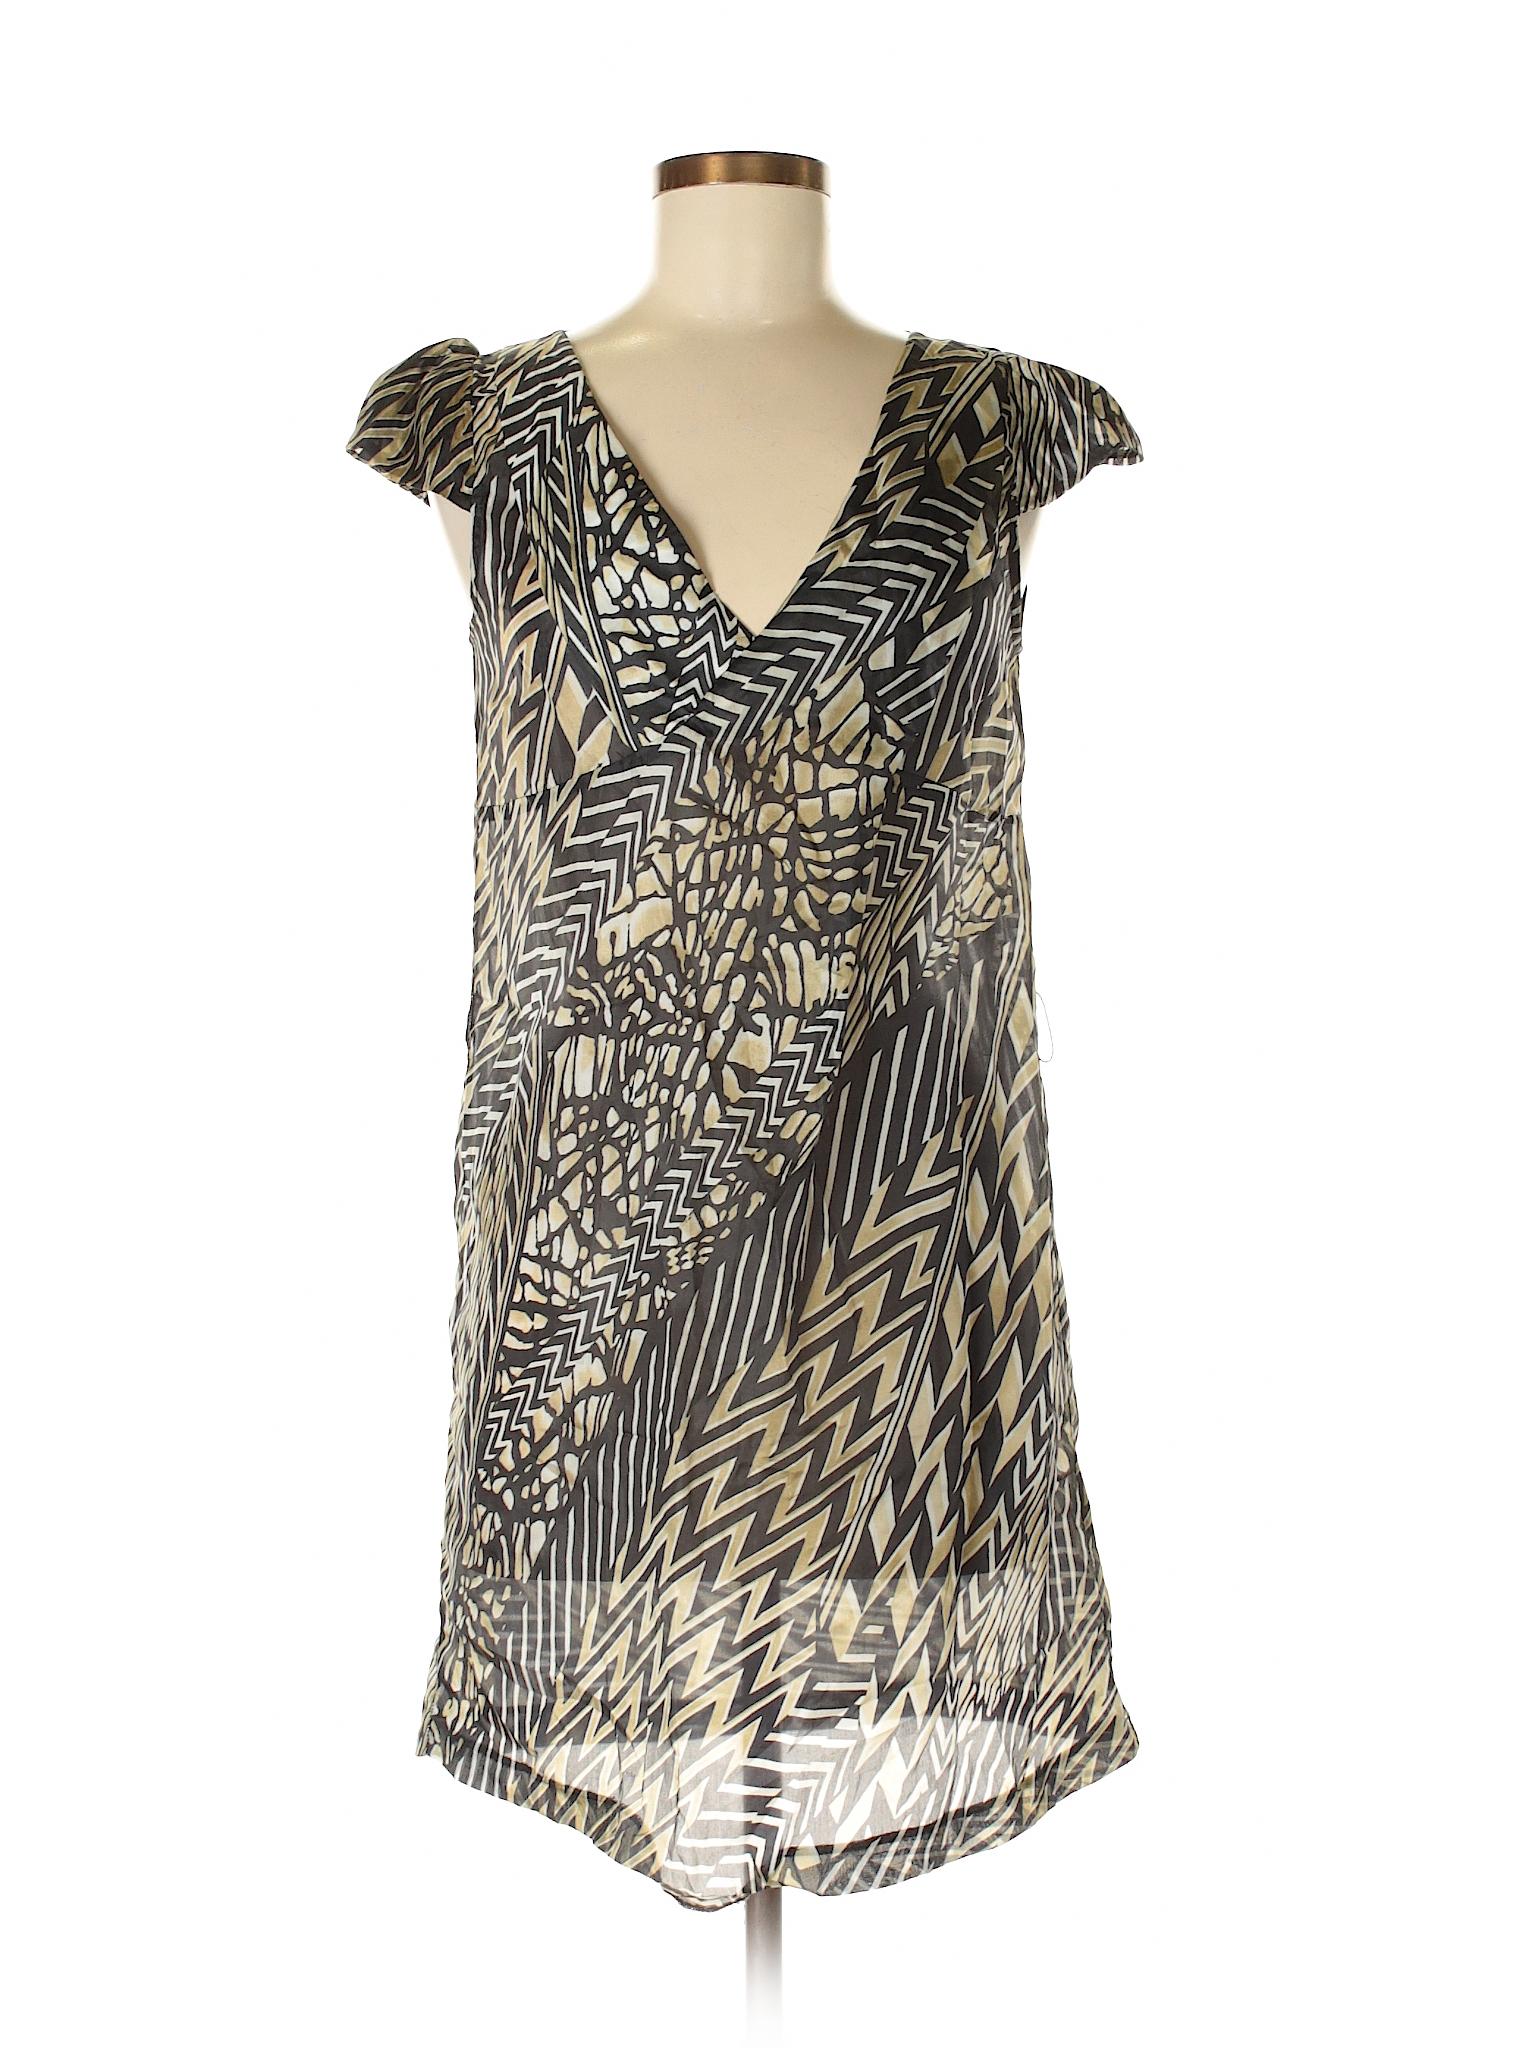 winter Casual Boutique Dress Zara Boutique winter Boutique winter Zara Casual Dress aUTwTg